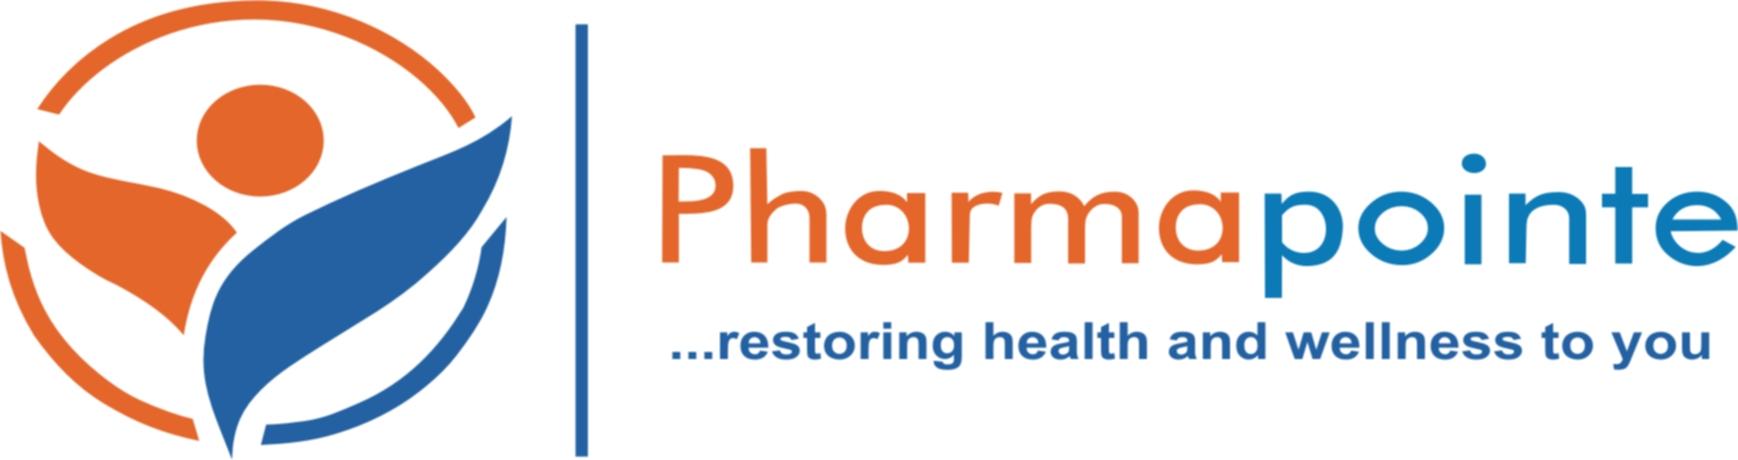 Pharmapointe